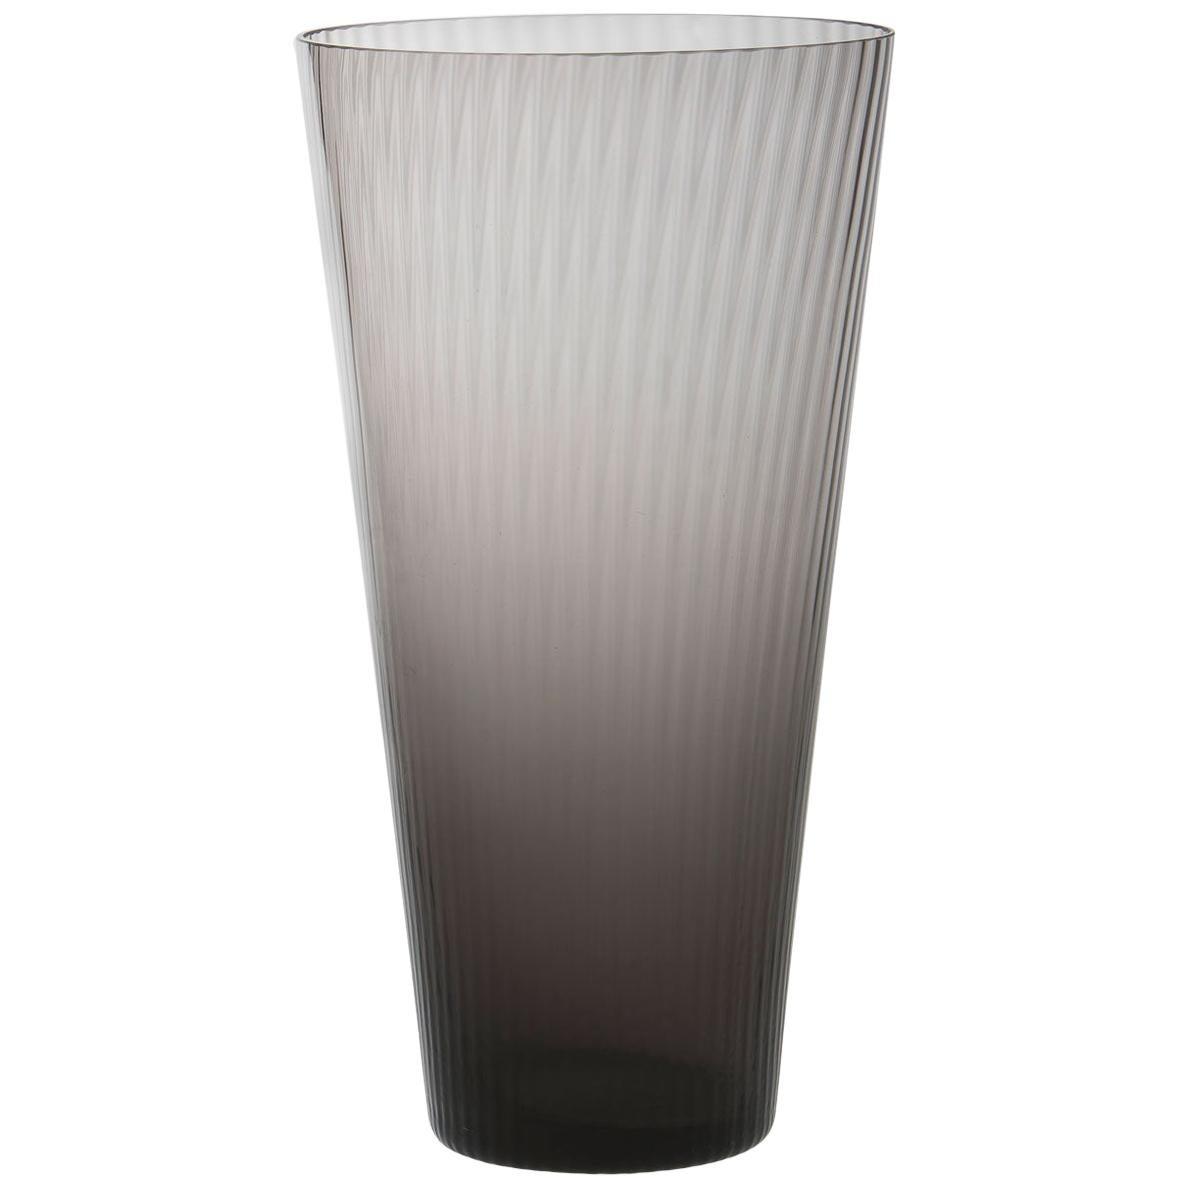 Vaso Squadrato34, Vase Handcrafted Muranese Glass, Lead Plisse MUN by VG